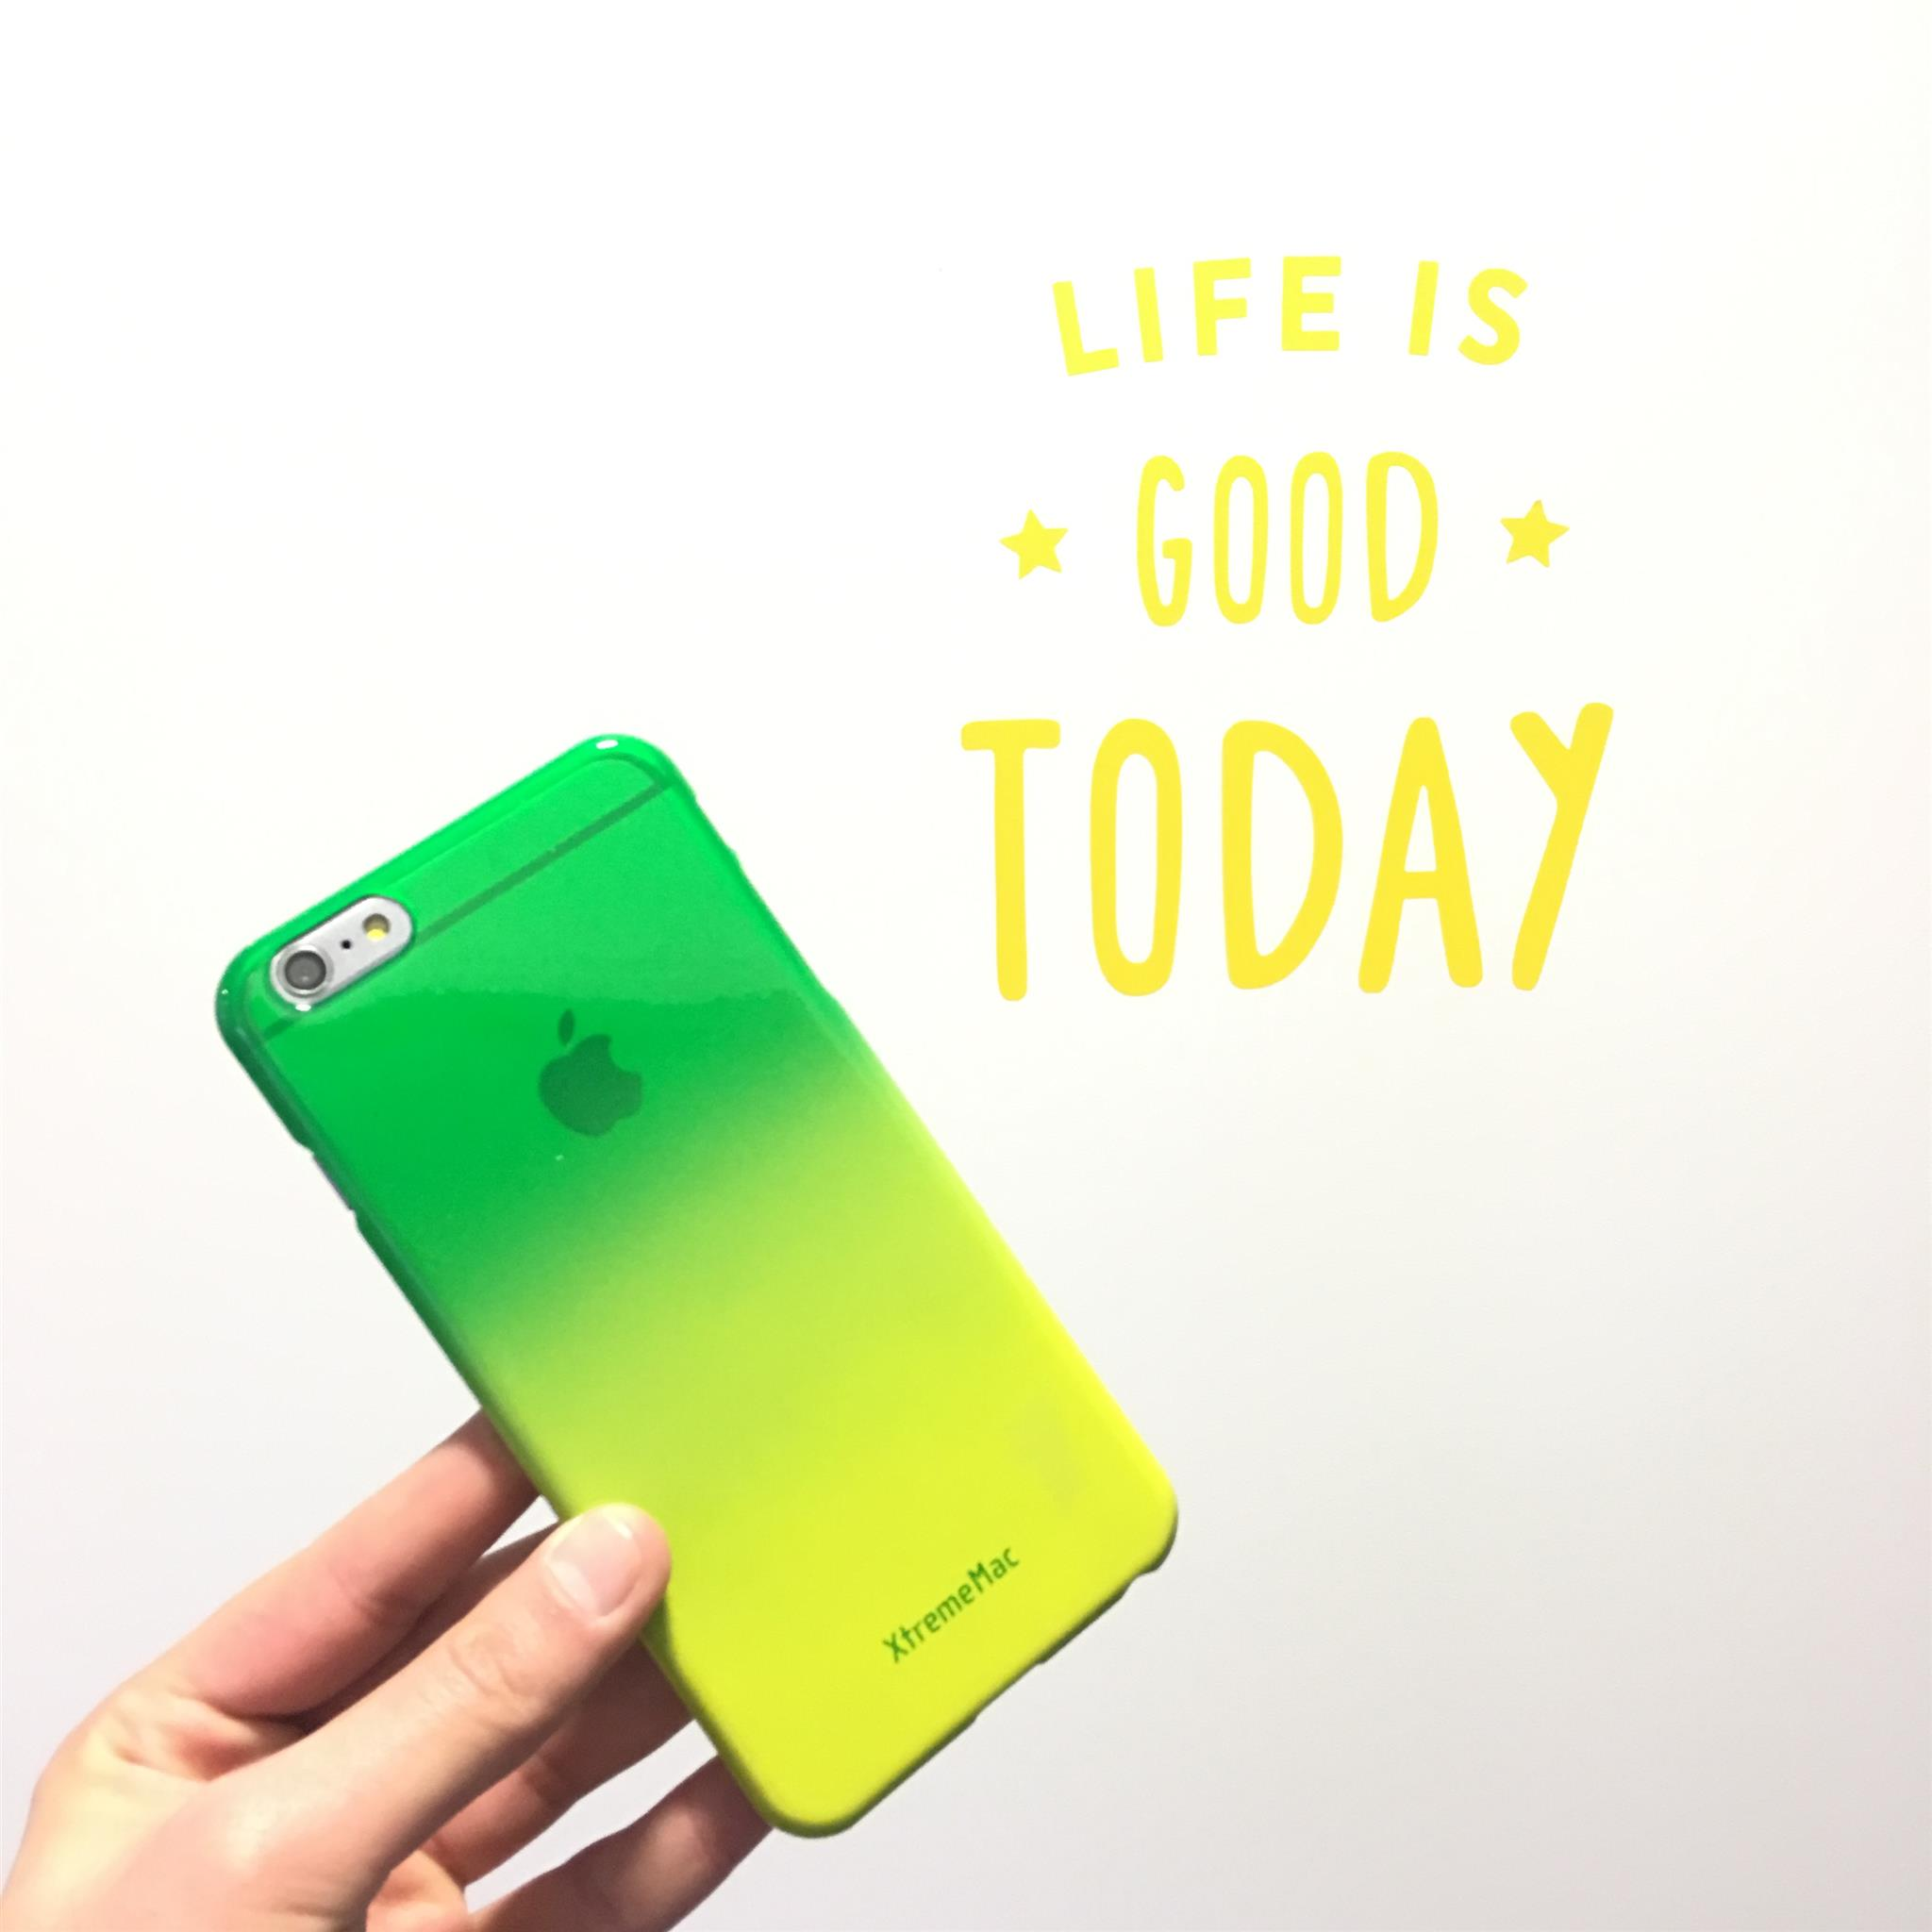 Coque pour iPhone 6 Microshield fade verte et jaune XtremeMac